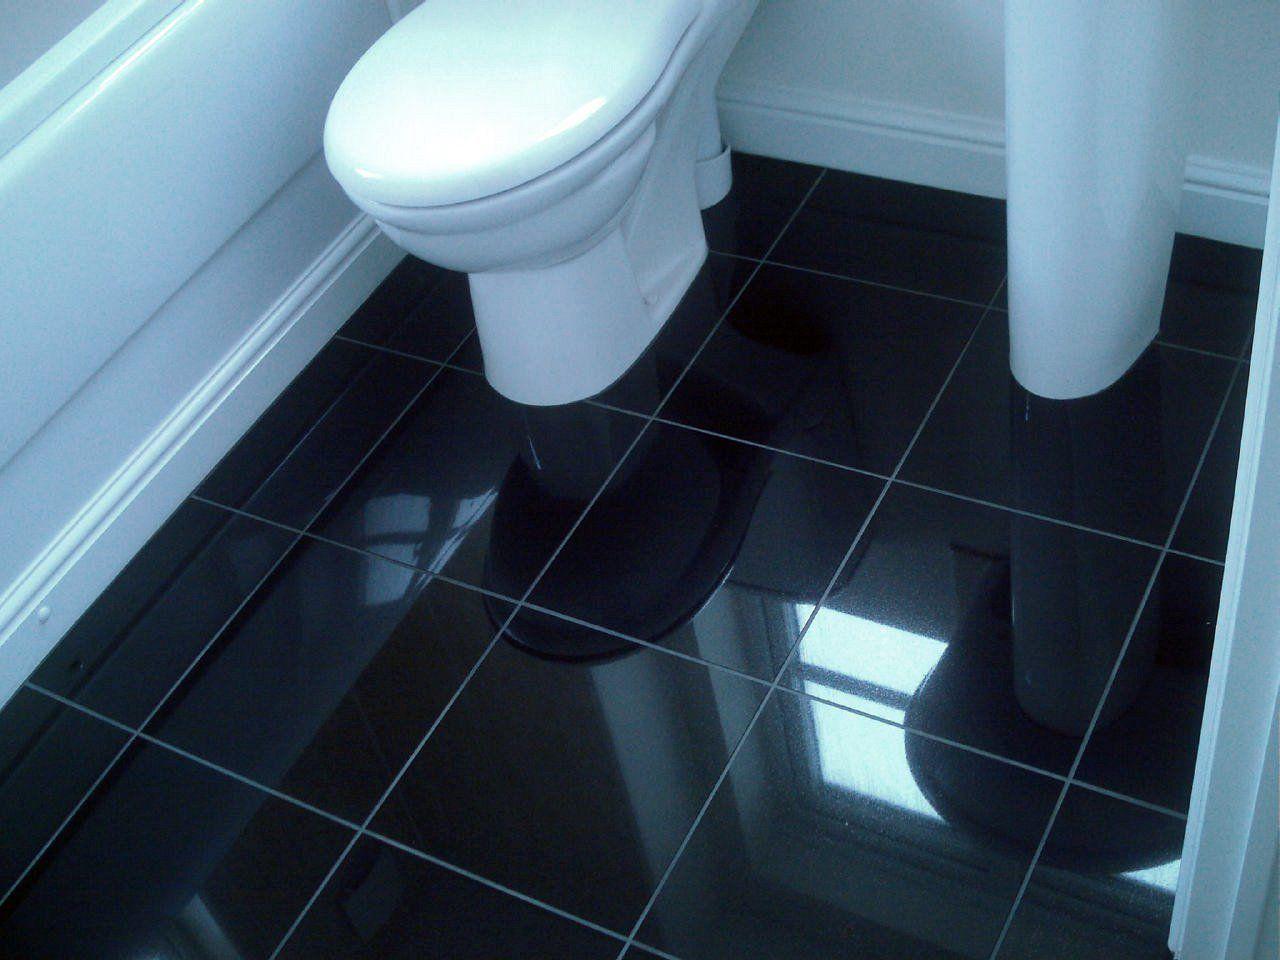 Ceramic Bathroom Floor Tile - A grand looking bathroom with all the ...